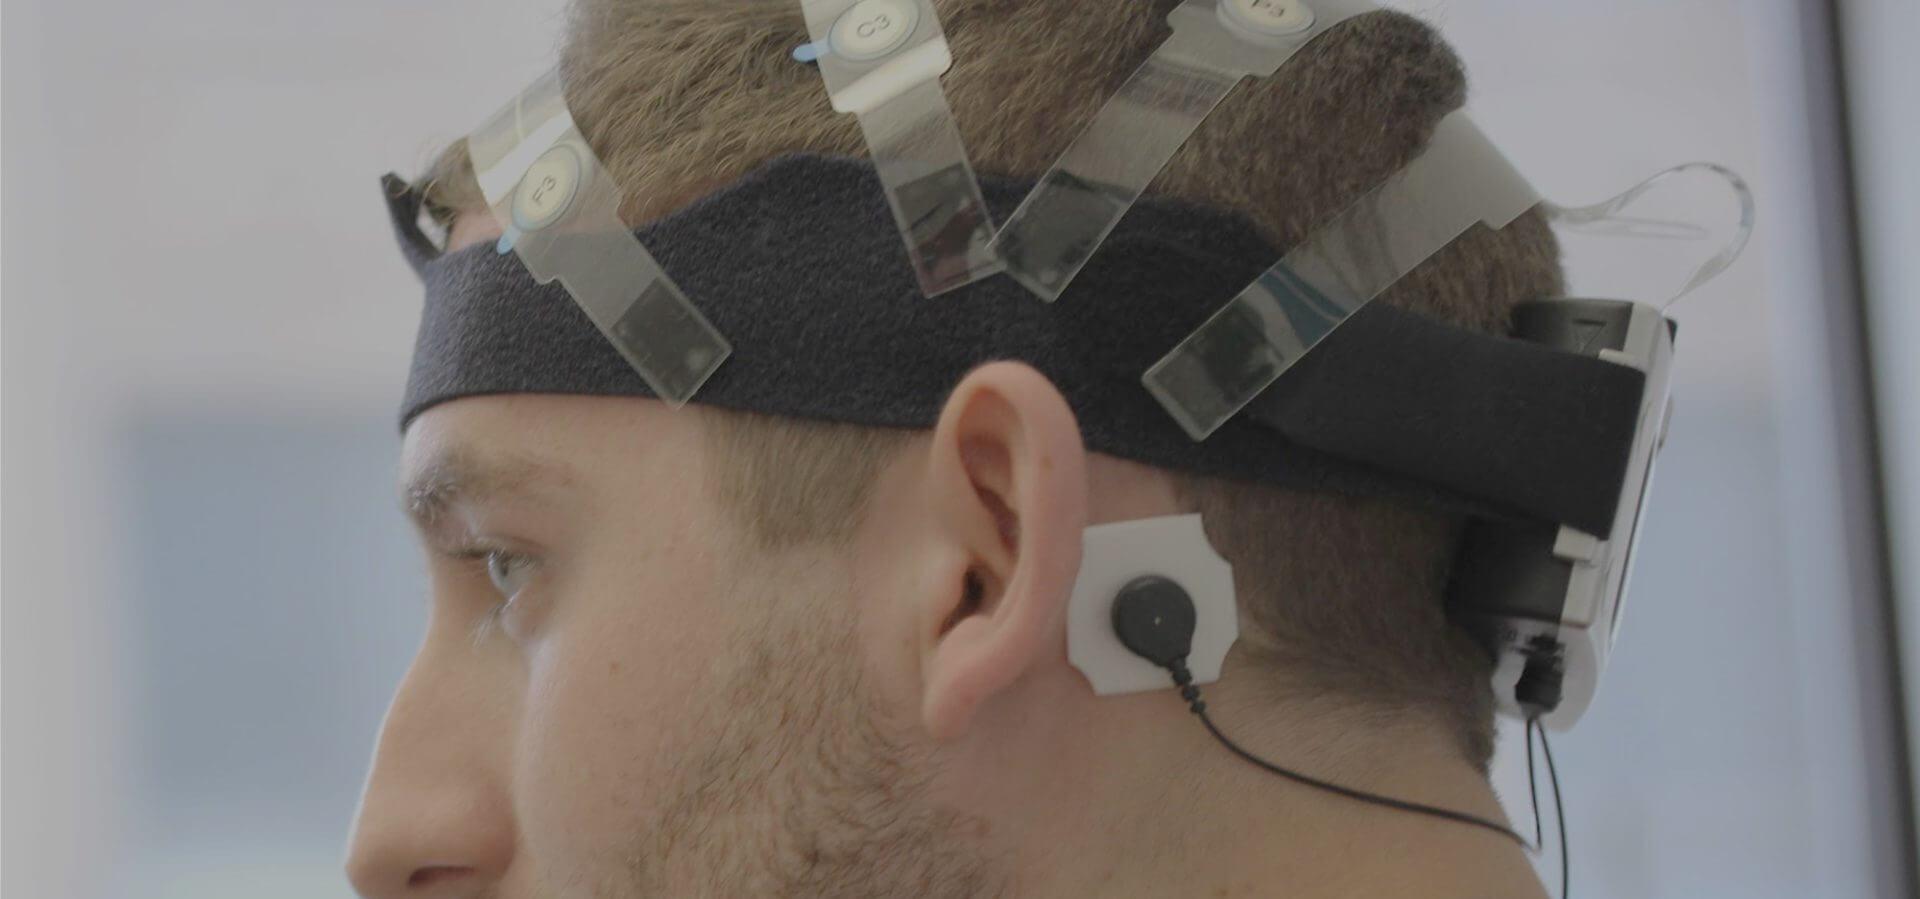 EEG headgear, in MediaBrix' lab.